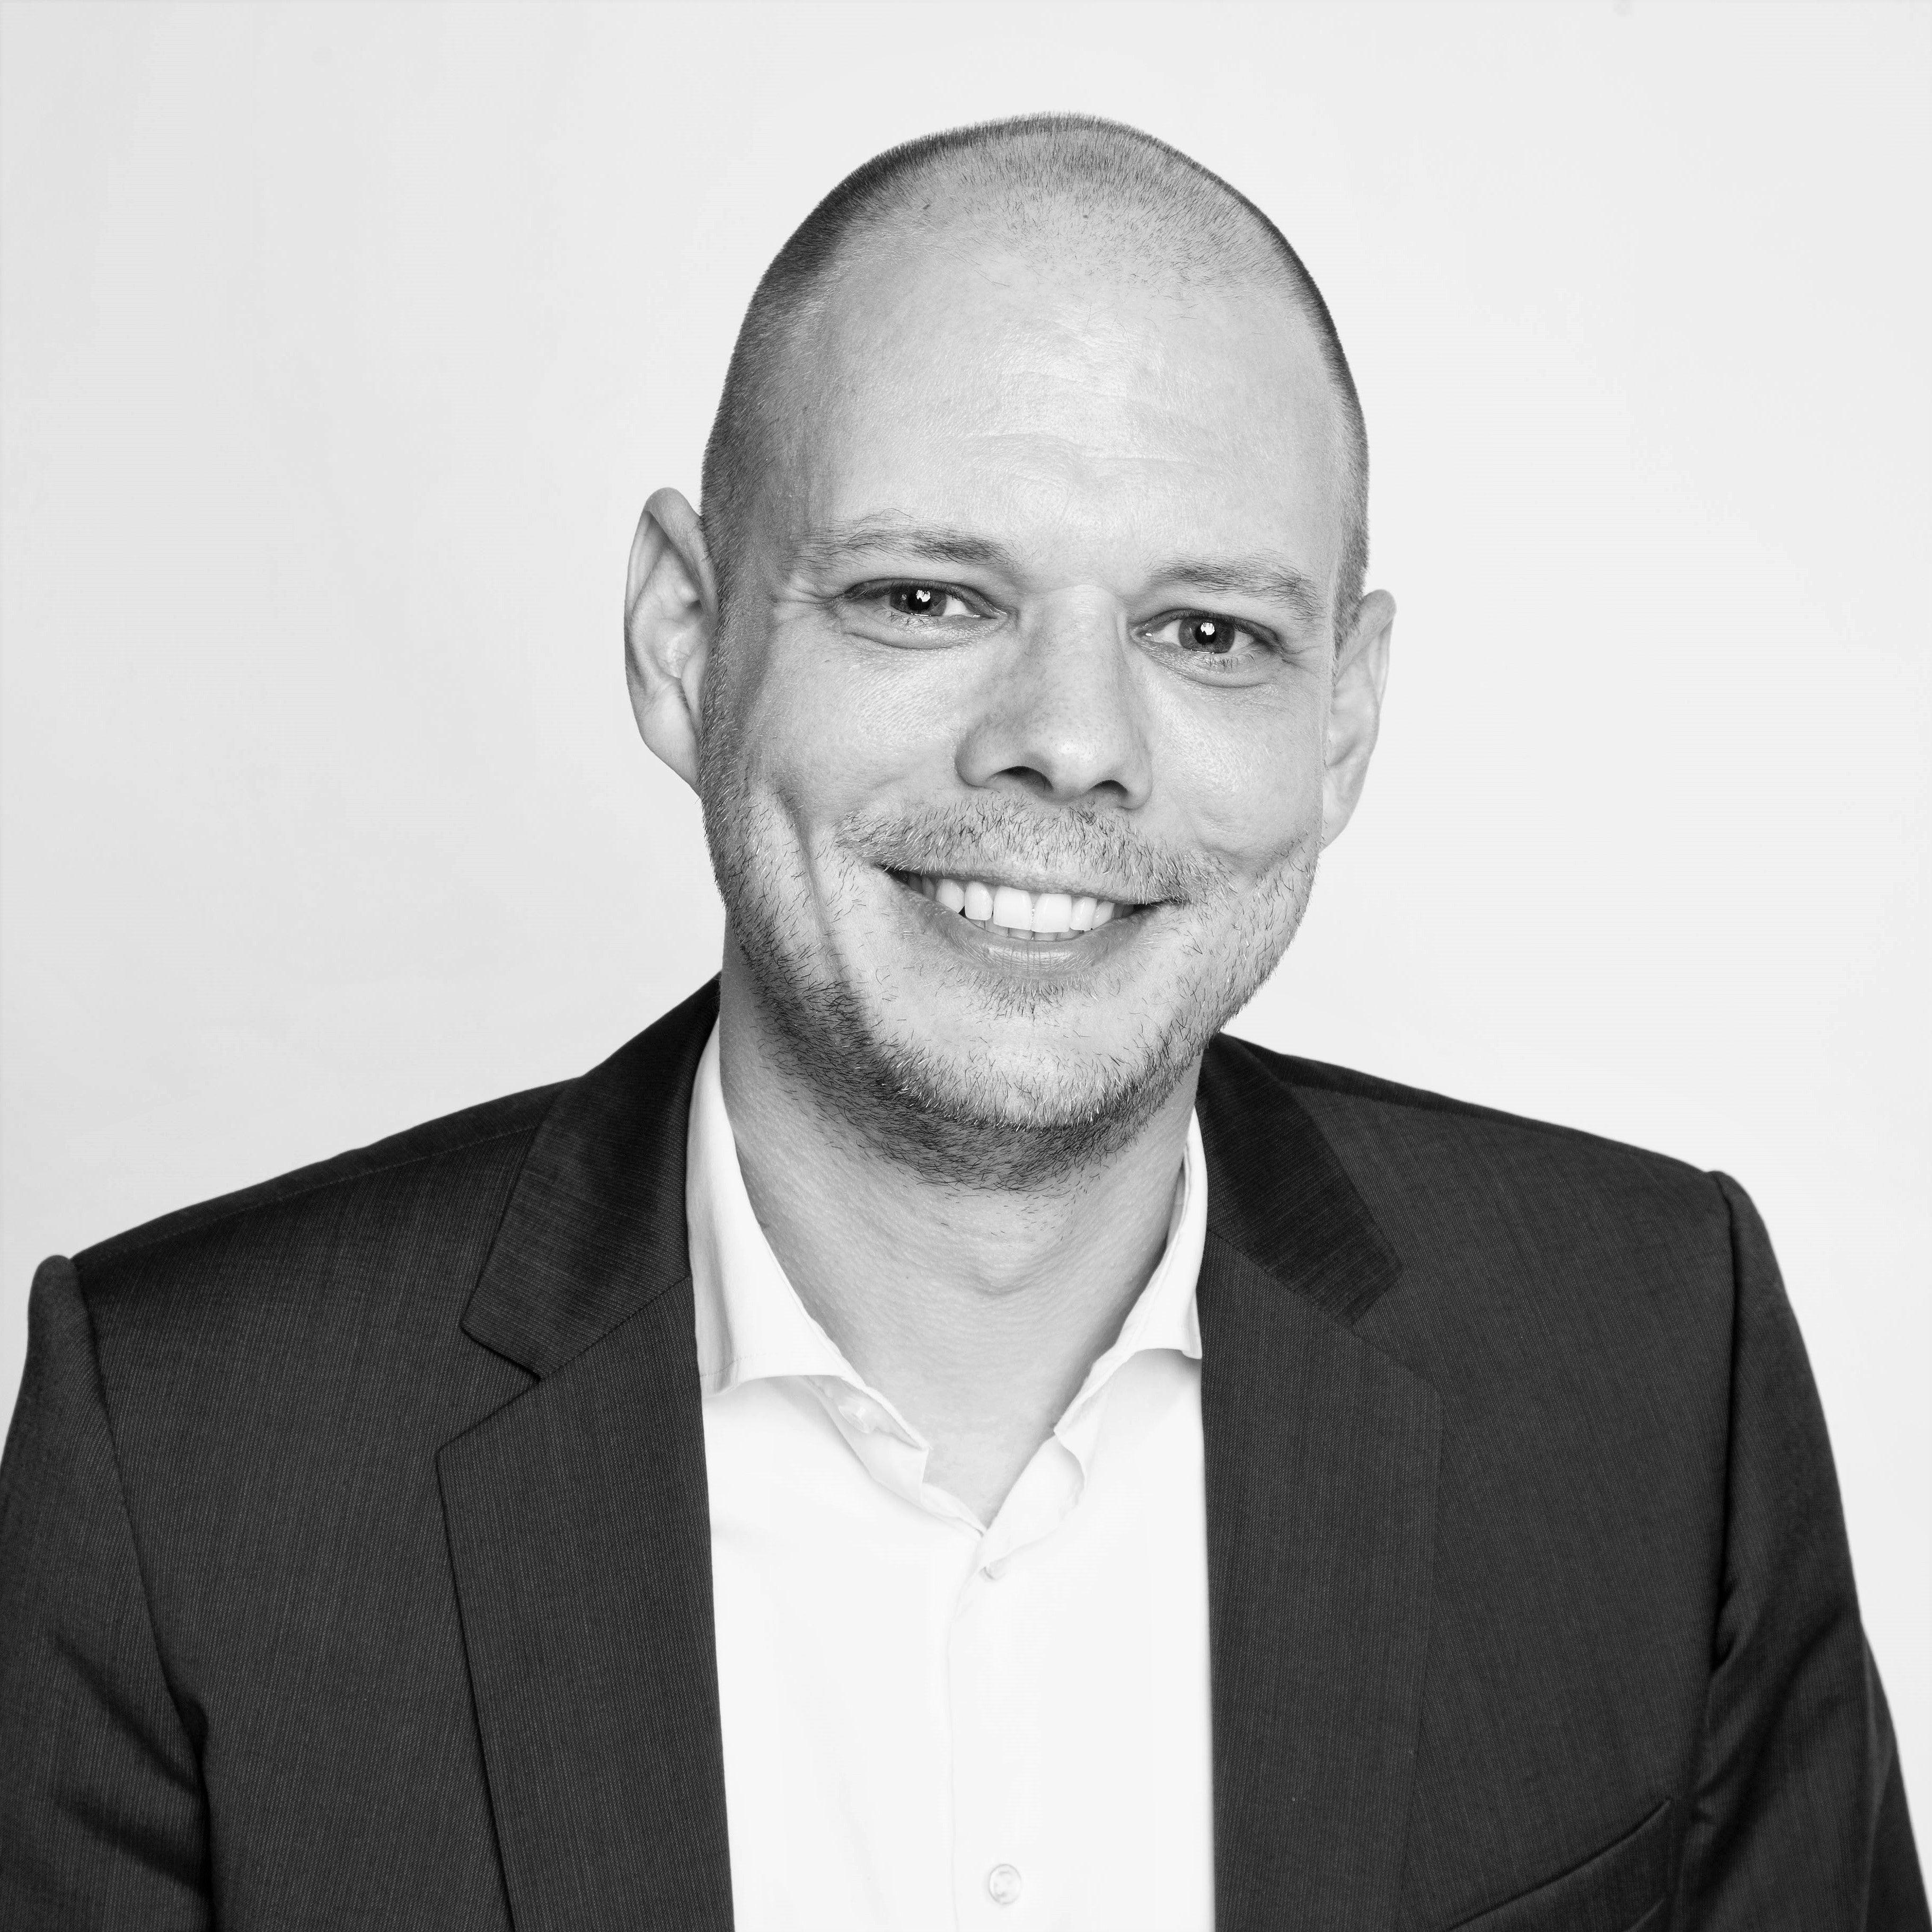 Theodor Esenwein, Managing Director Data Services, Dentsu Aegis Network